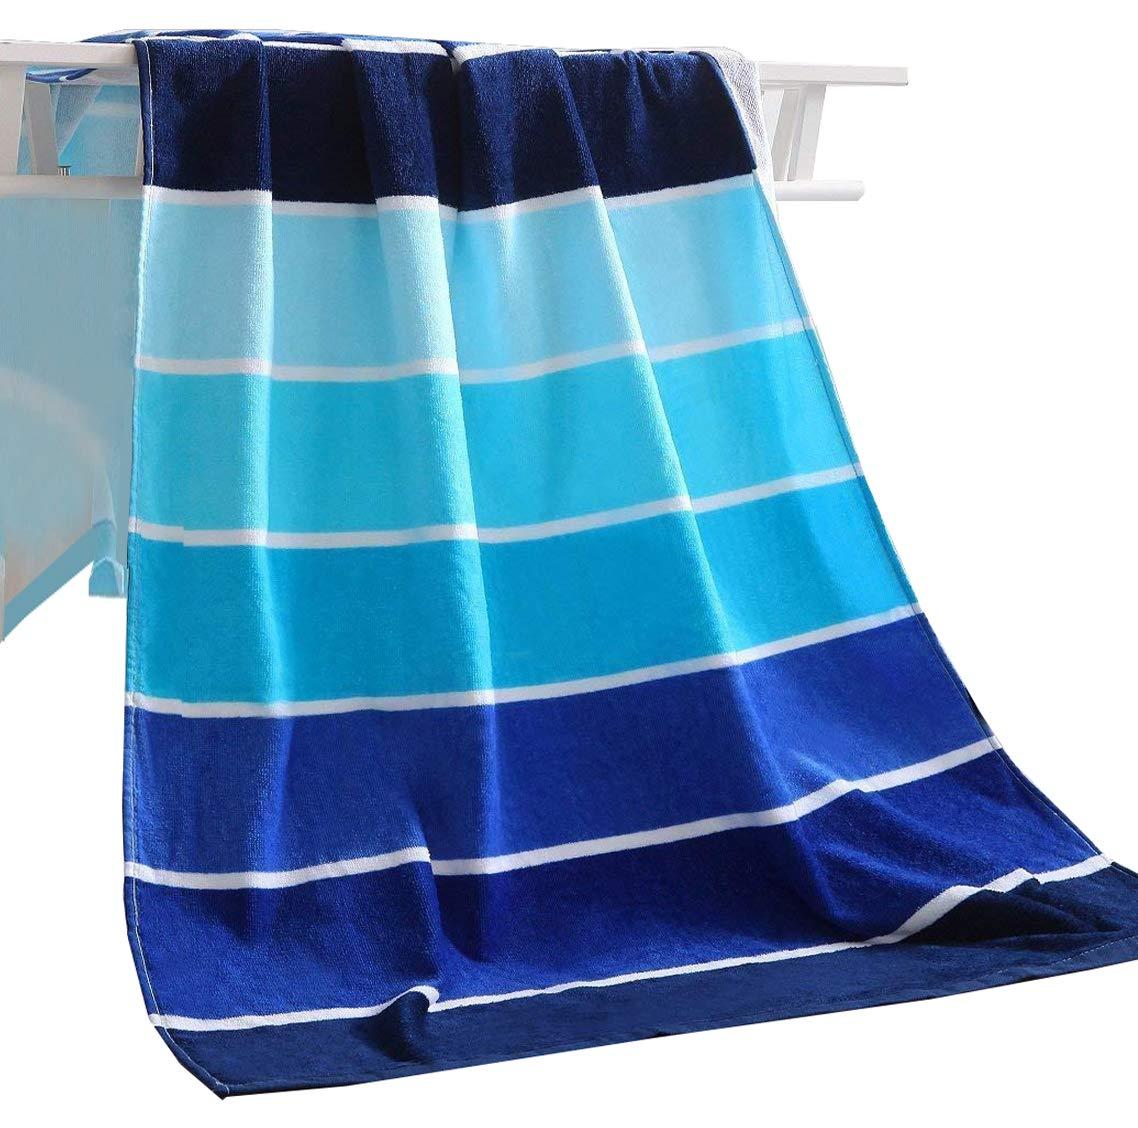 Exclusivo Mezcla 100% Cotton Beach Towel, Pool Towel Gradient Blue Striped (30